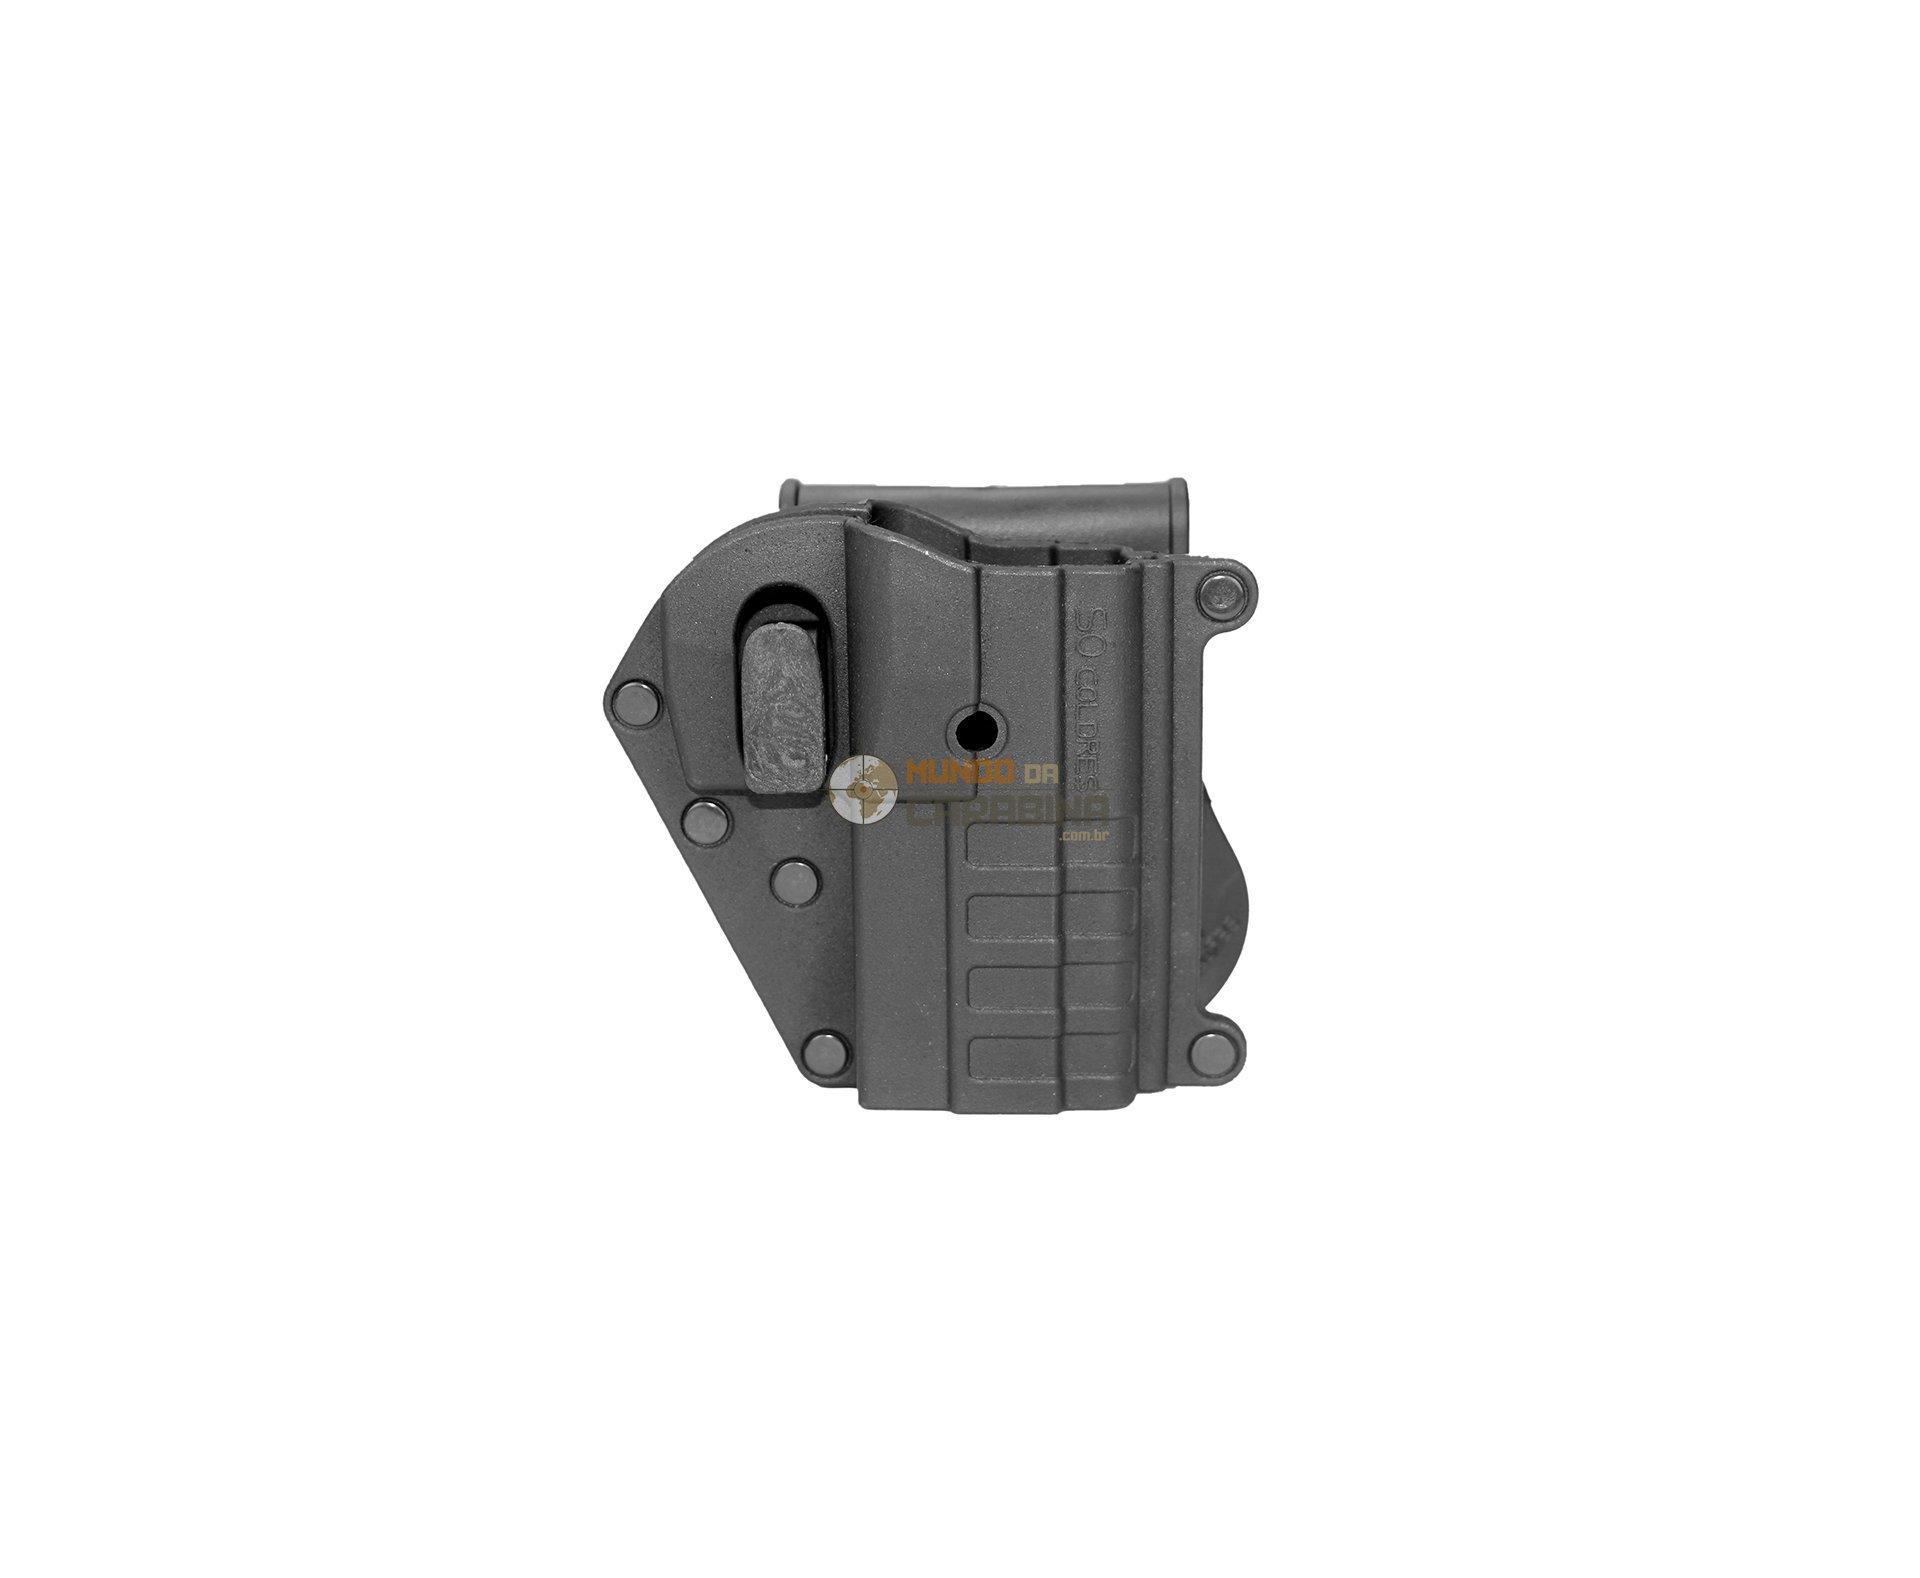 Coldre Cintura Pistola 938-940-945 Destro - Só Coldres